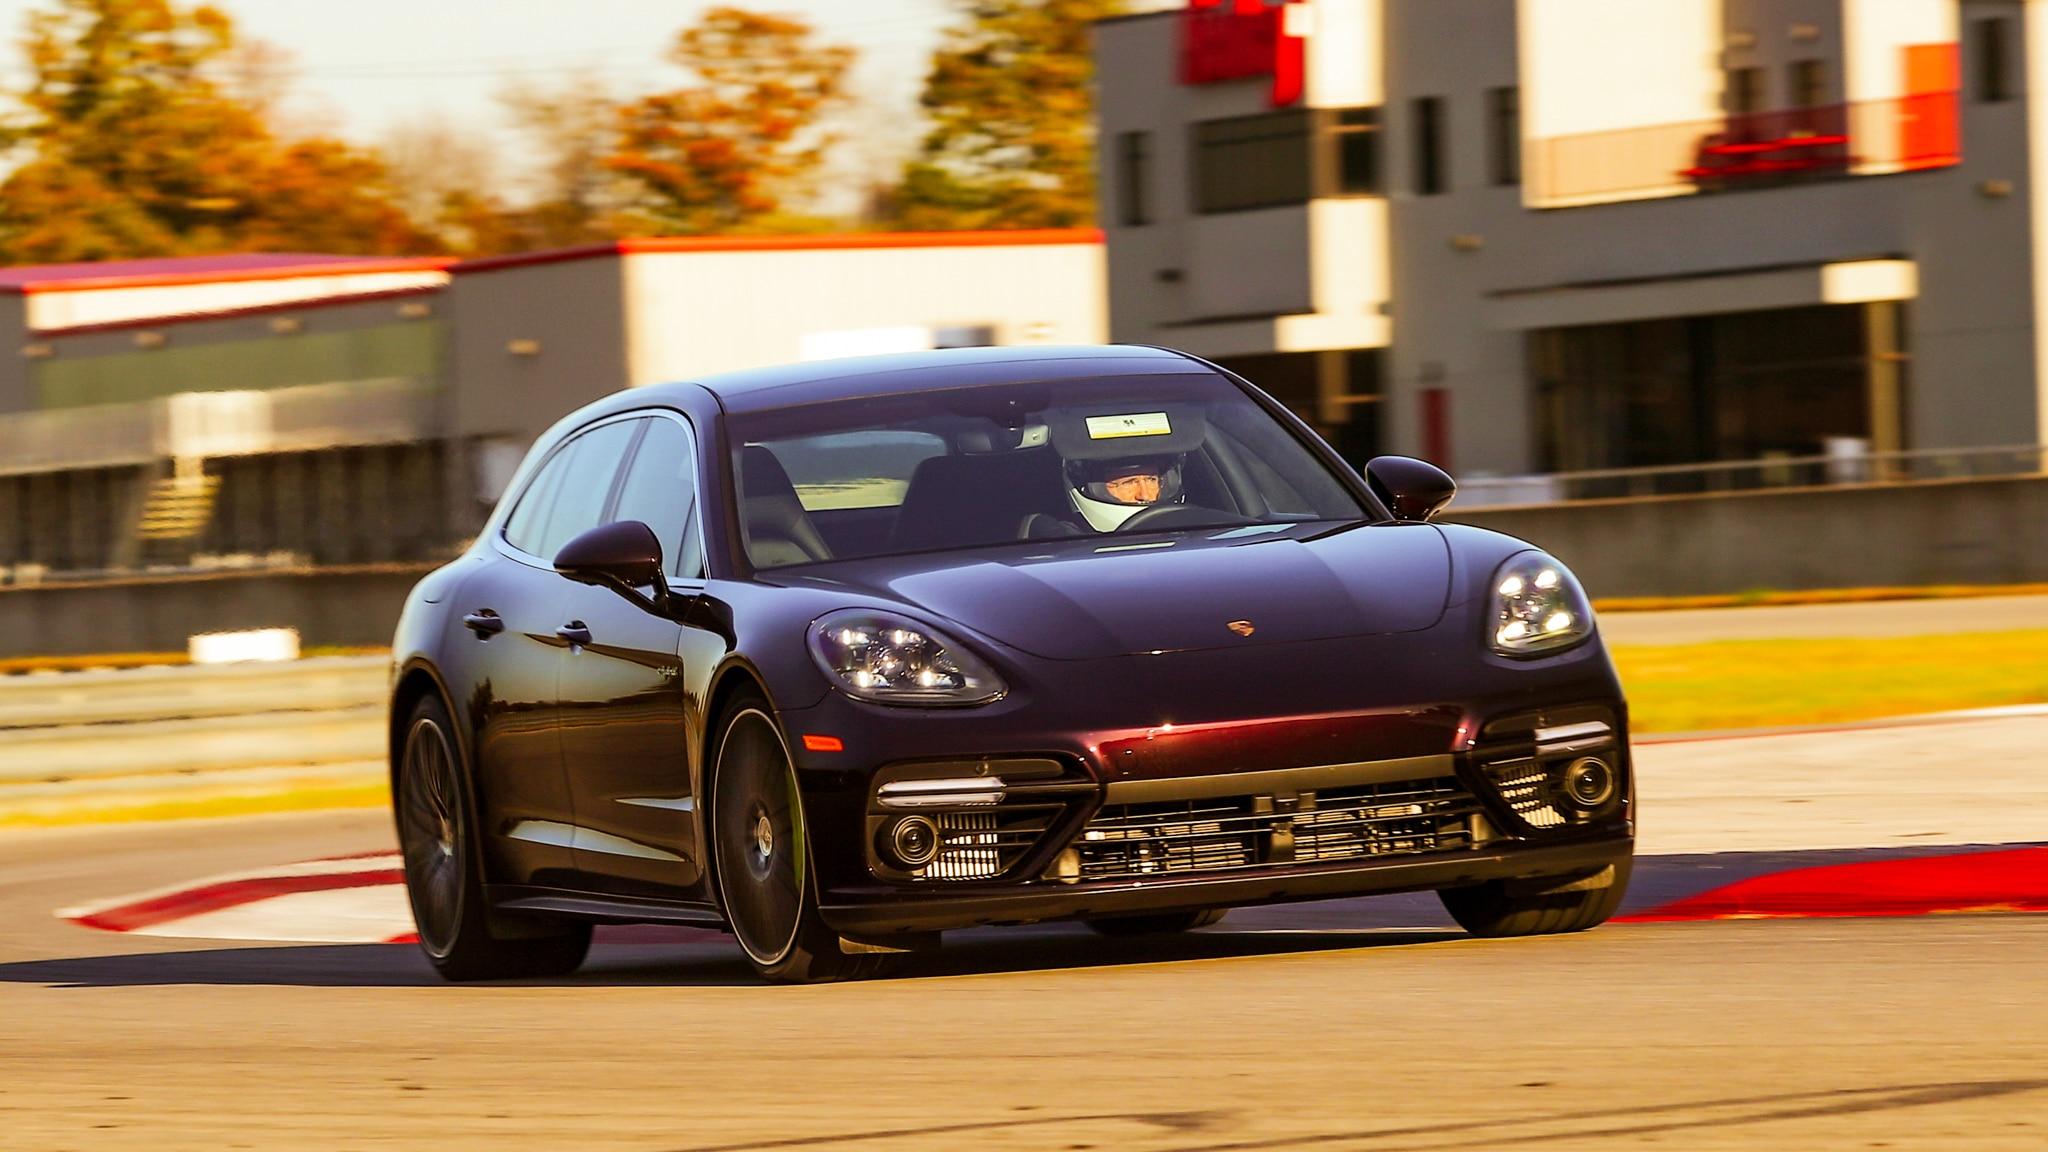 Tested Porsche Panamera Turbo S E Hybrid Sport Turismo Goes To The Ragged Edge At Ncm Motorsports Park